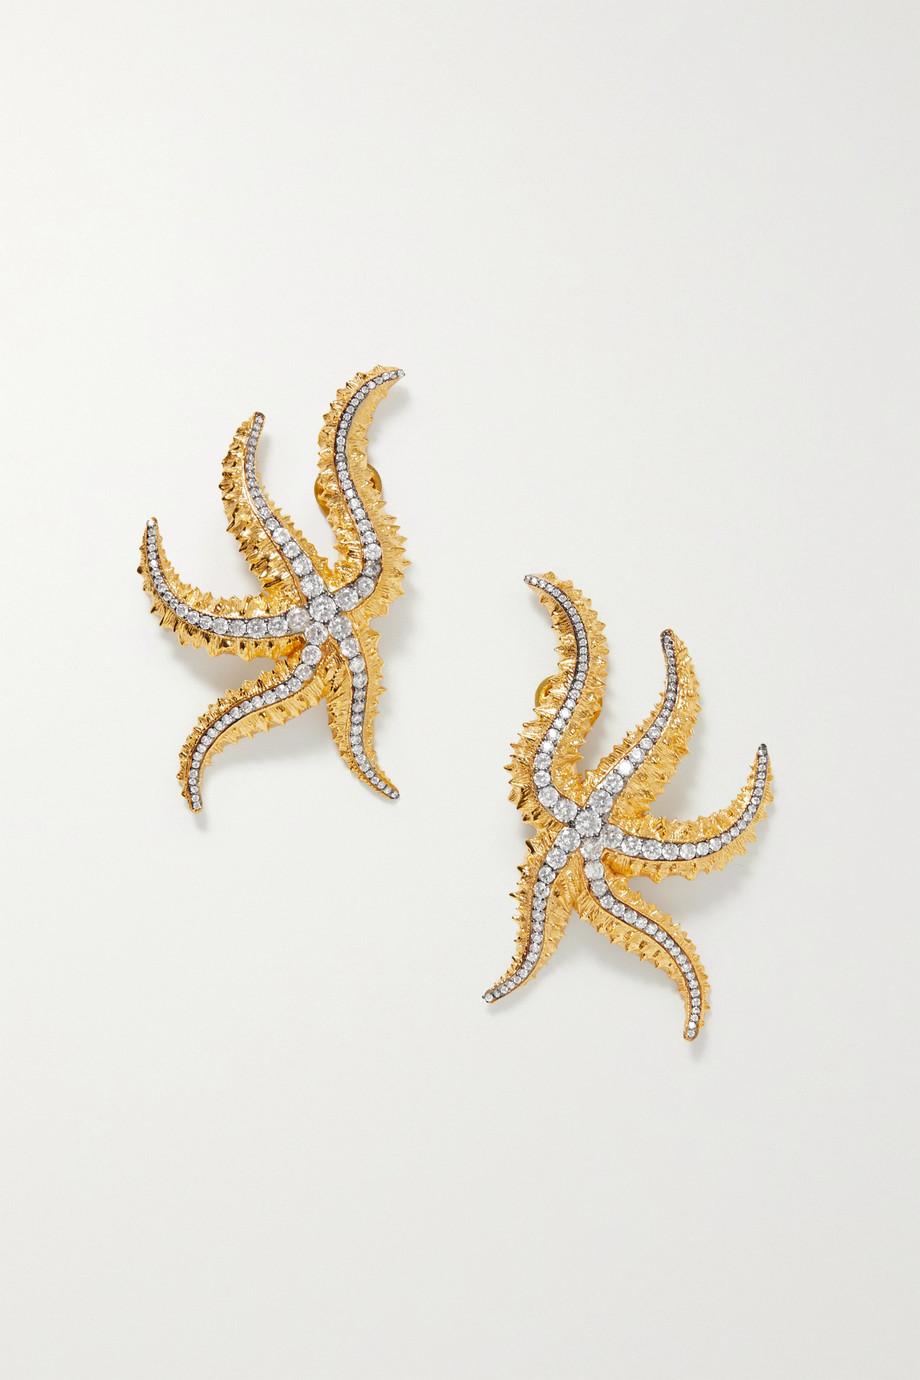 Begüm Khan Sirena gold-plated crystal clip earrings